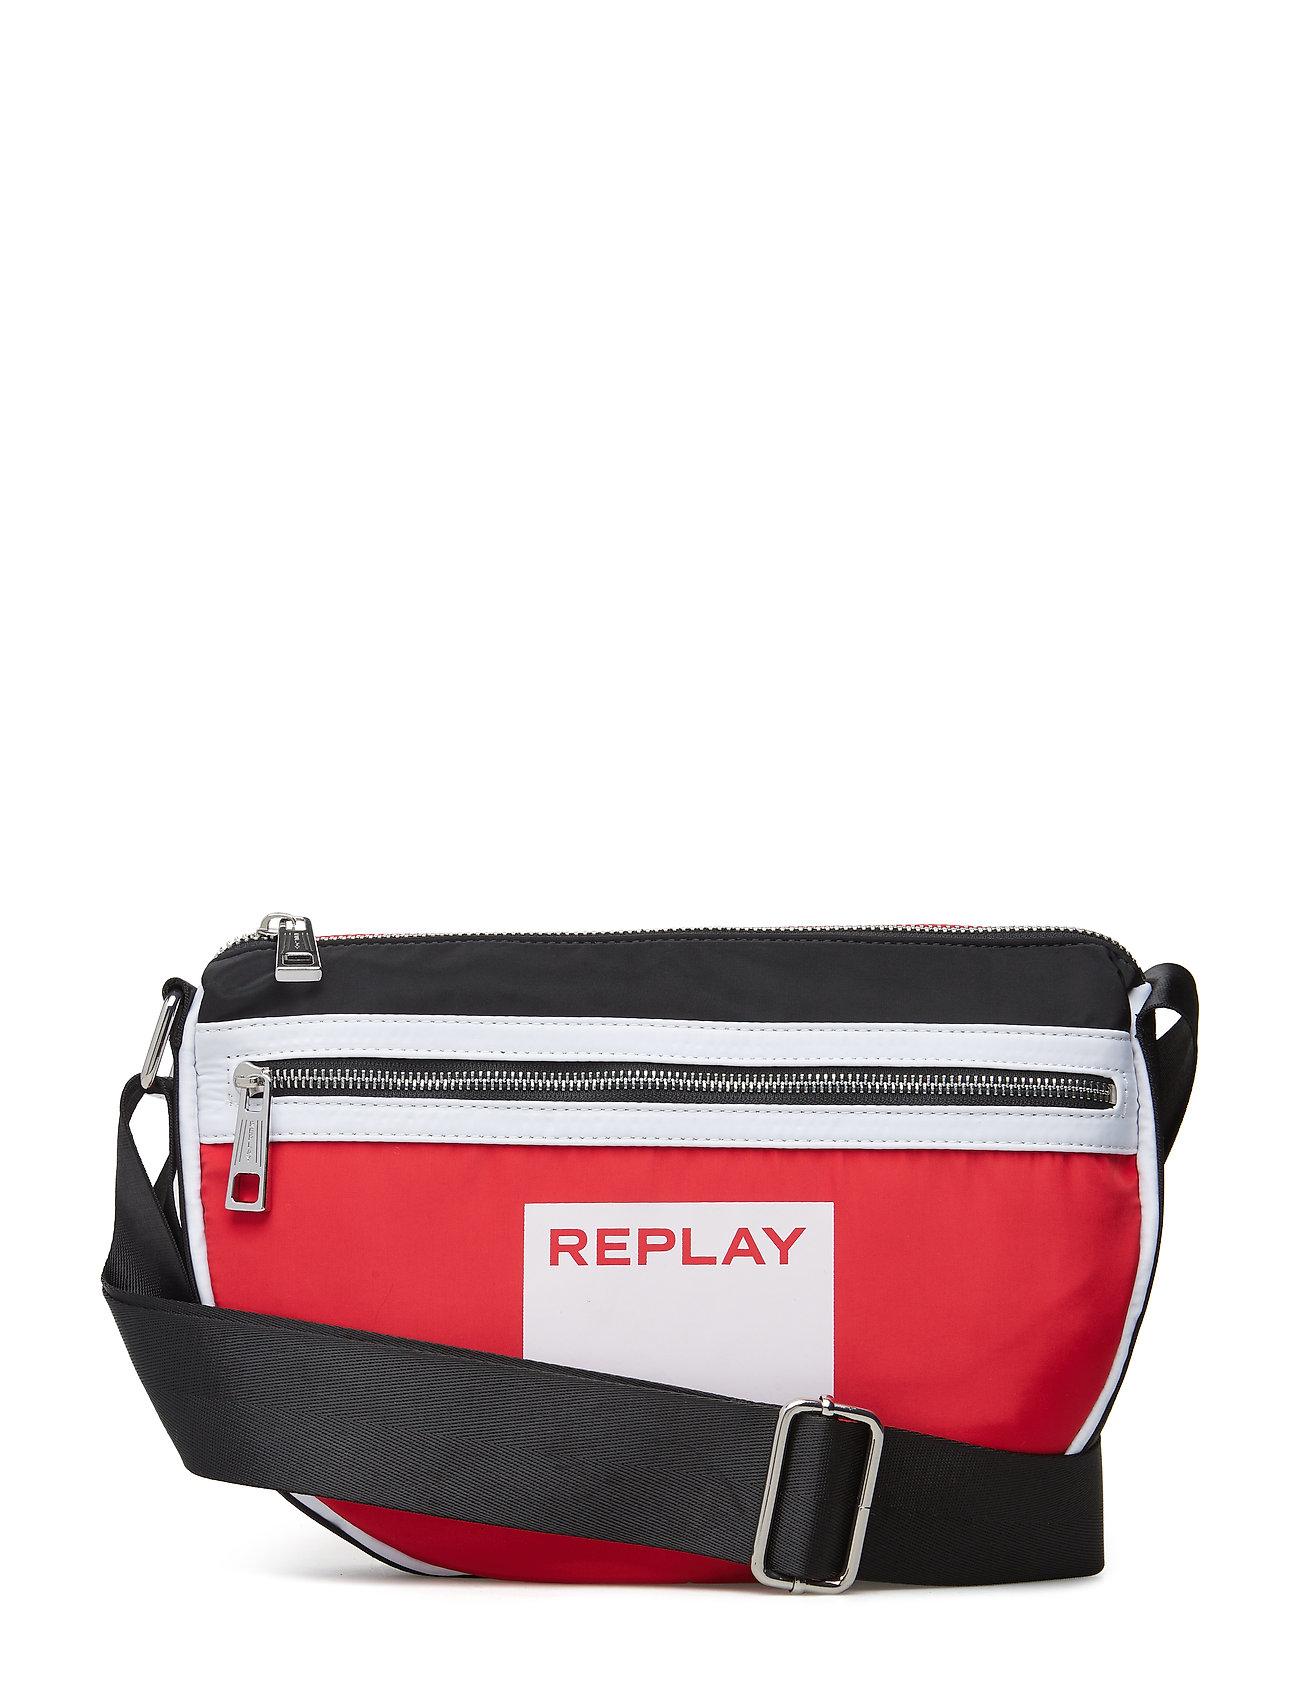 Replay Bag - BLOOD RED -BLACK-OPTICAL WHITE